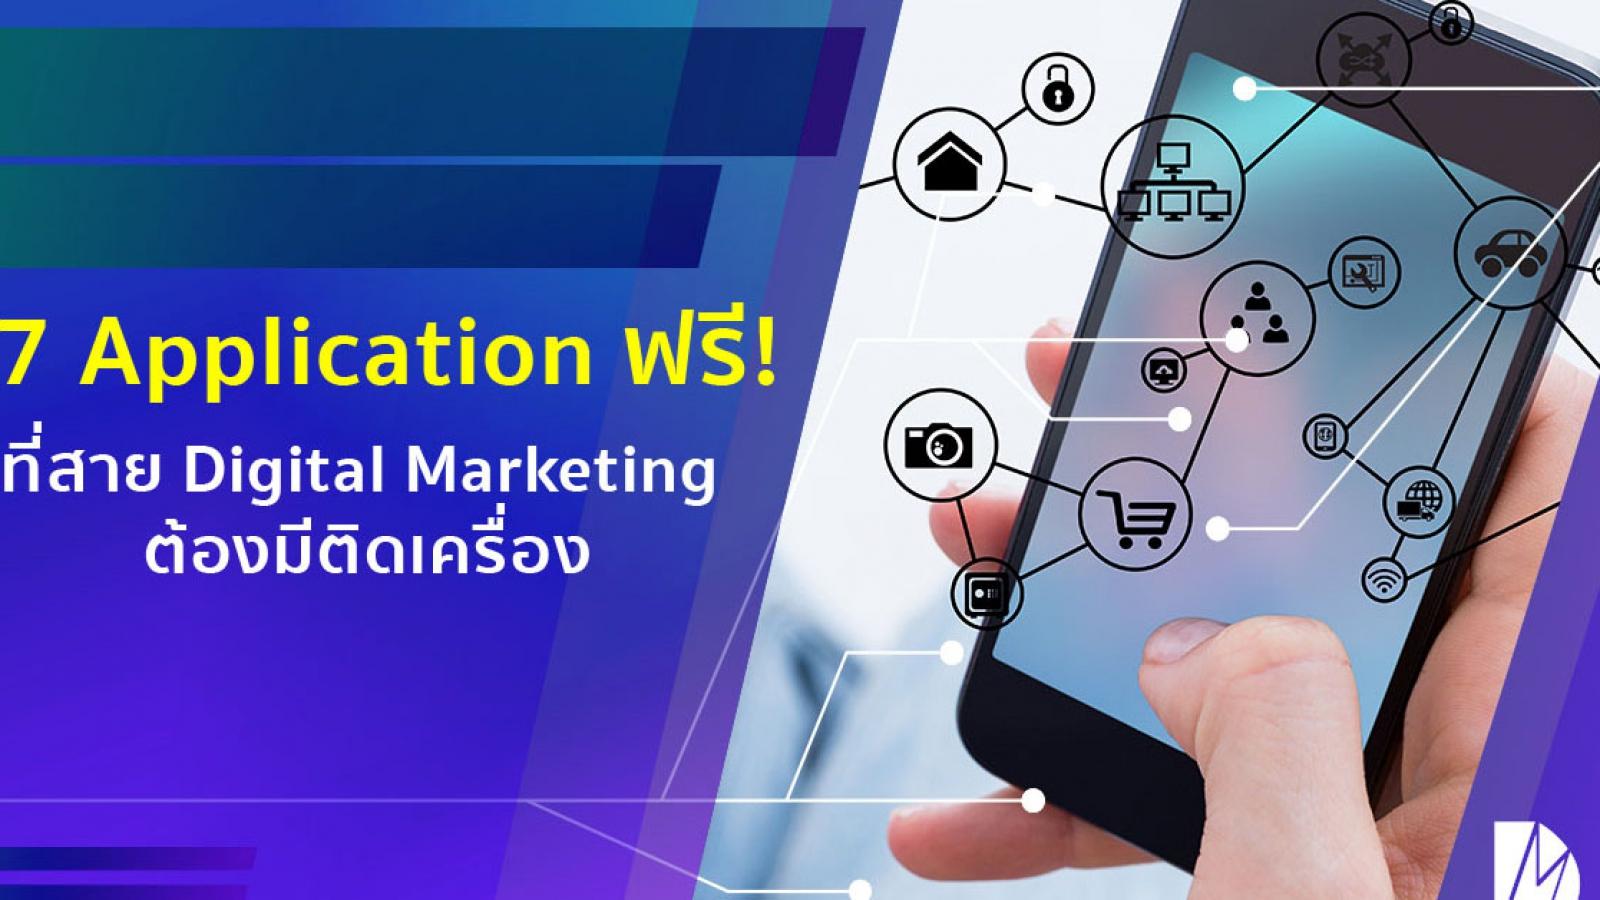 7 Application ฟรีสำหรับนักการตลาดออนไลน์ Digital Marketing